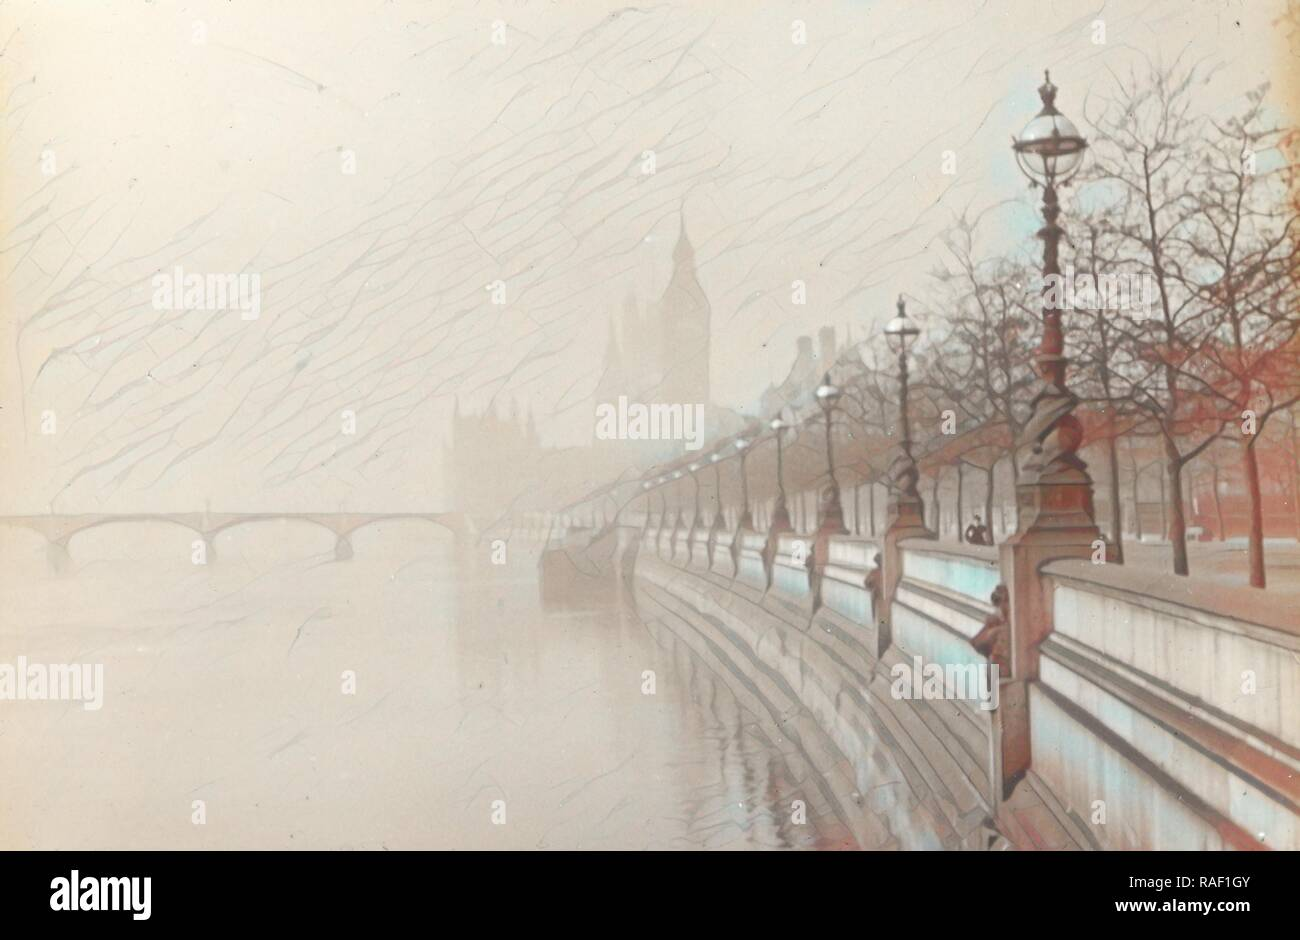 London. Embankment, Frederick H. Evans (British, 1853 - 1943), 1908, Lantern slide, 4.2 x 6.4 cm (1 11,16 x 2 9,16 in reimagined - Stock Image